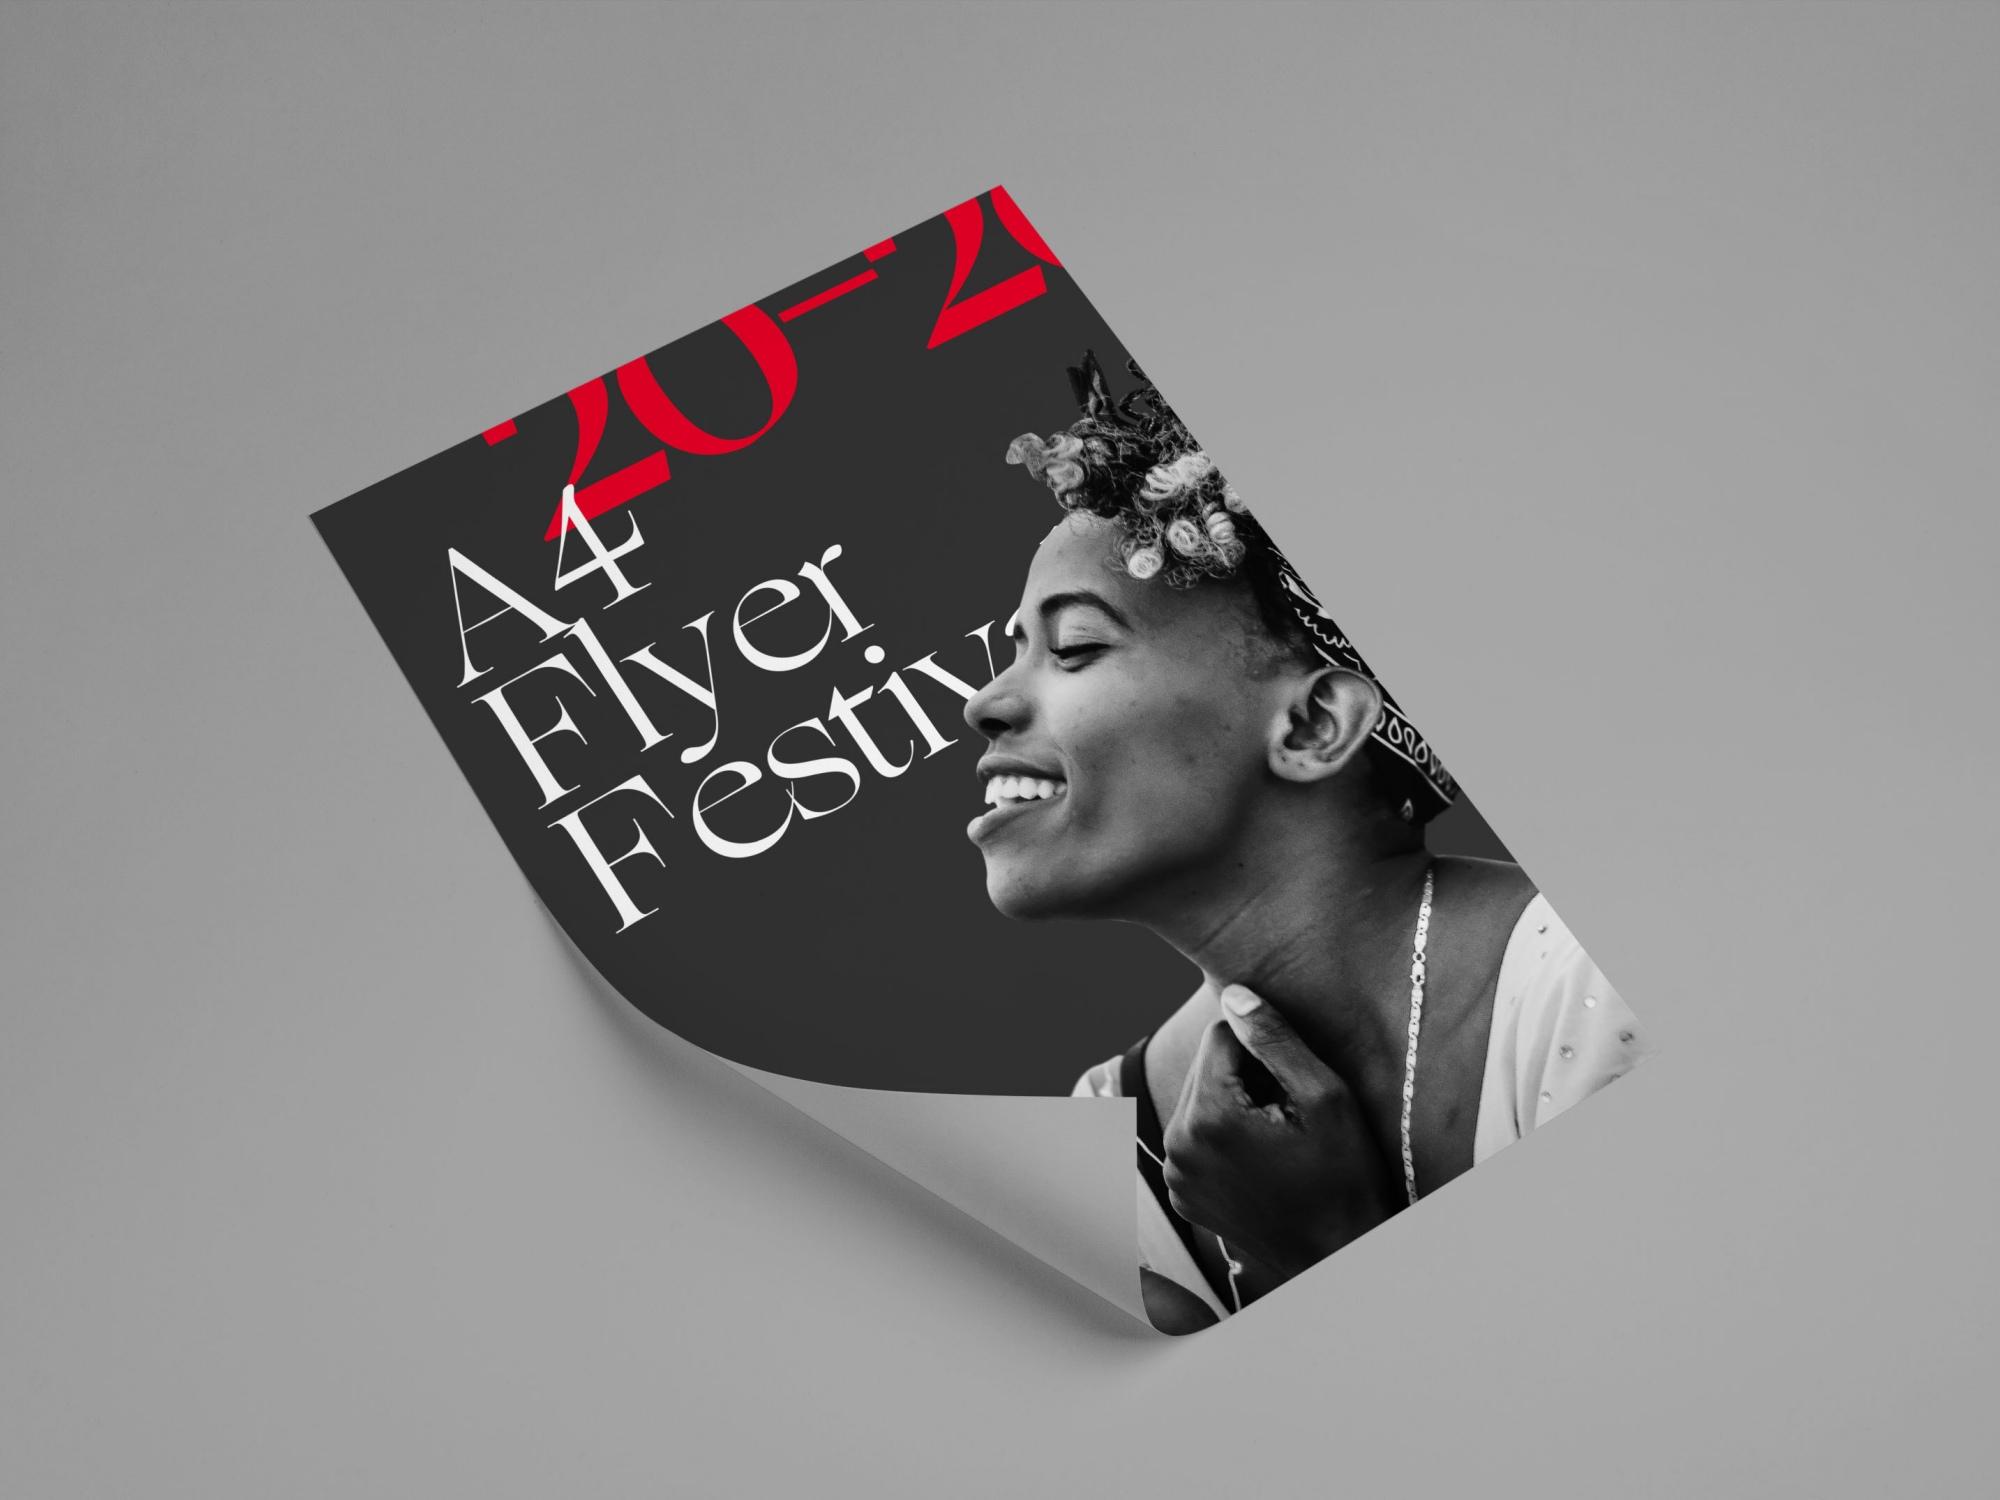 A4 Single-sided flyer made by Kiakiaprint